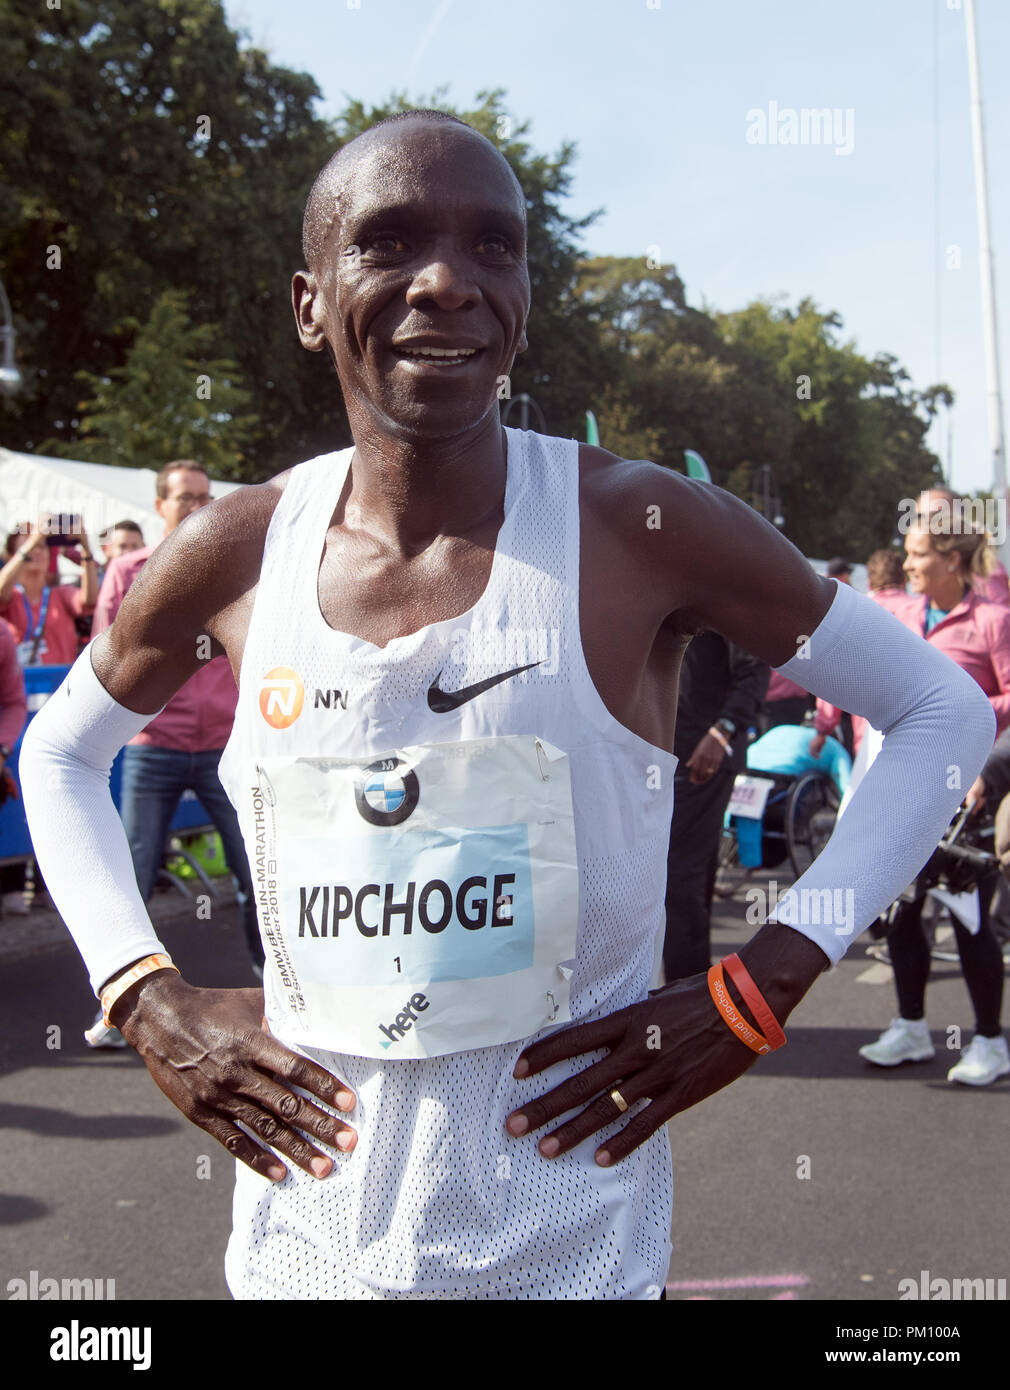 Berlin, Germany. 16 September 2018, Berlin: Kenyan Eliud Kipchoge wins the 45th BMW Berlin Marathon in 2:01:39. Photo: Soeren Stache/dpa Credit: dpa picture alliance/Alamy Live News - Stock Image